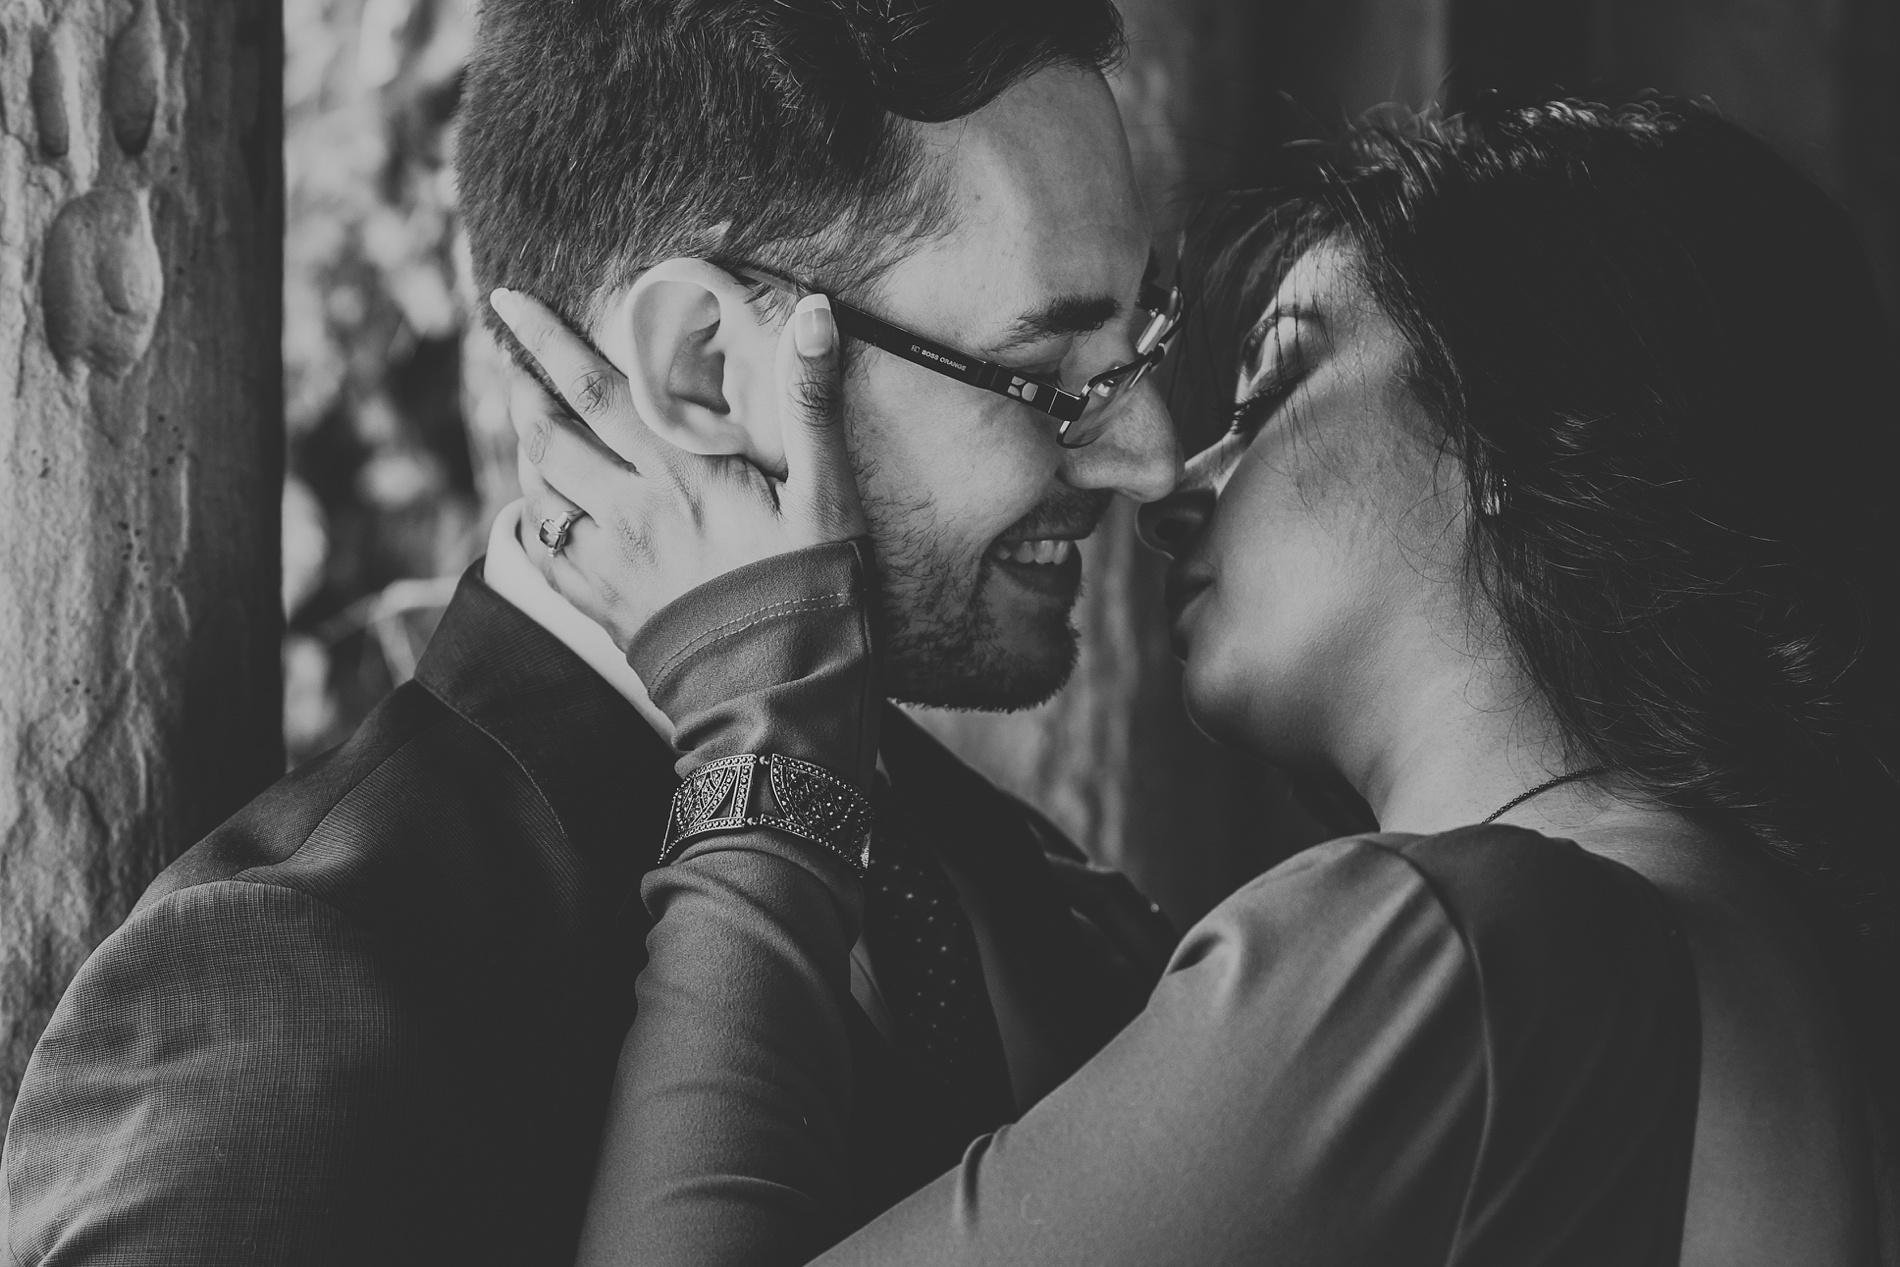 toronto-Wedding-photographer-best-engagement-shoot-uoft_0006.jpg